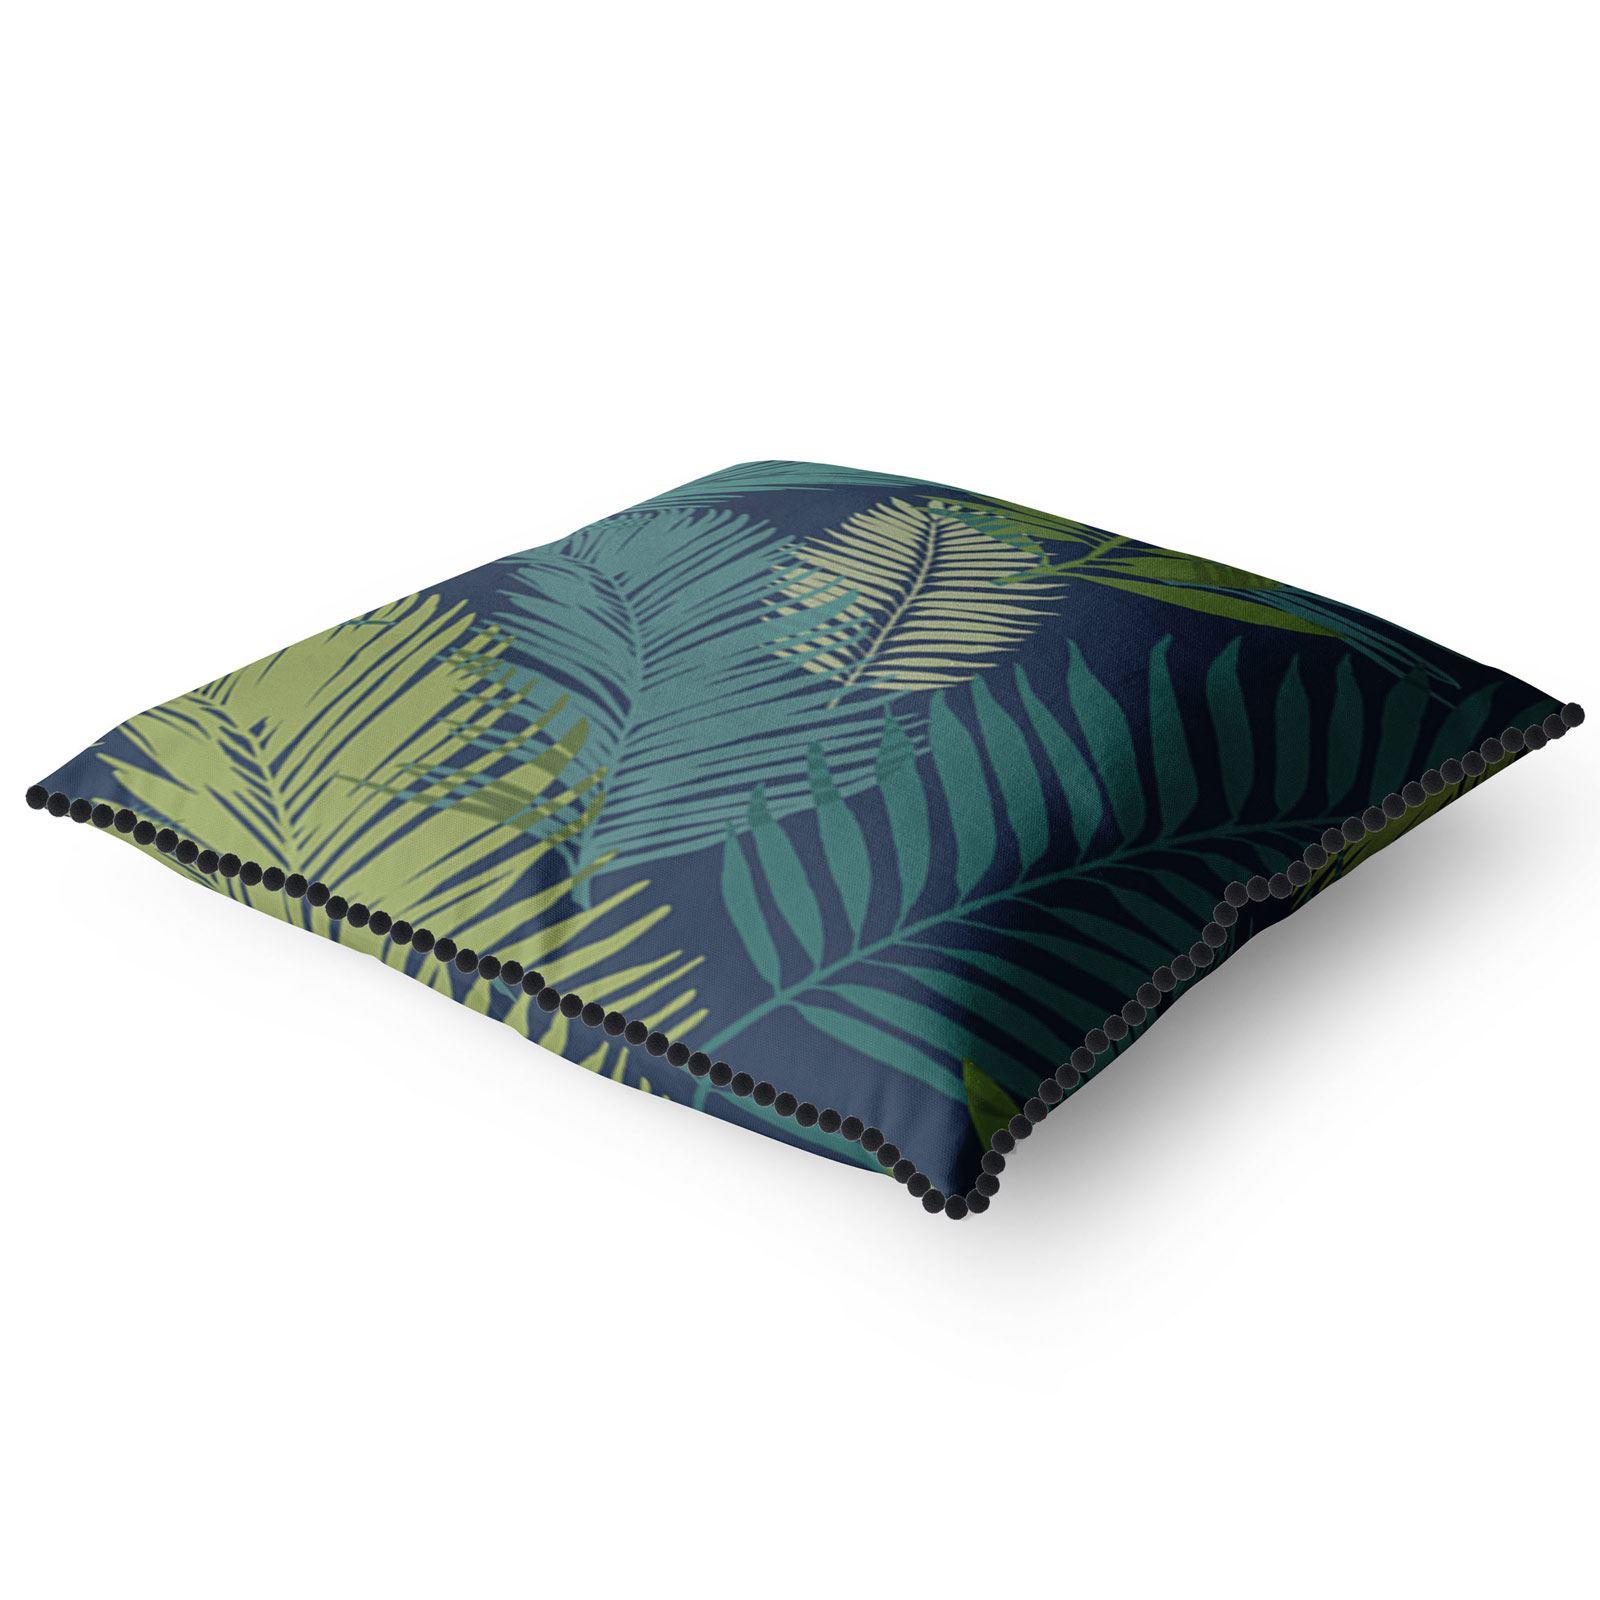 Teal-Blue-Duck-Egg-Cushion-Covers-18-034-x18-034-45cm-x-45cm-Luxury-Cover thumbnail 3